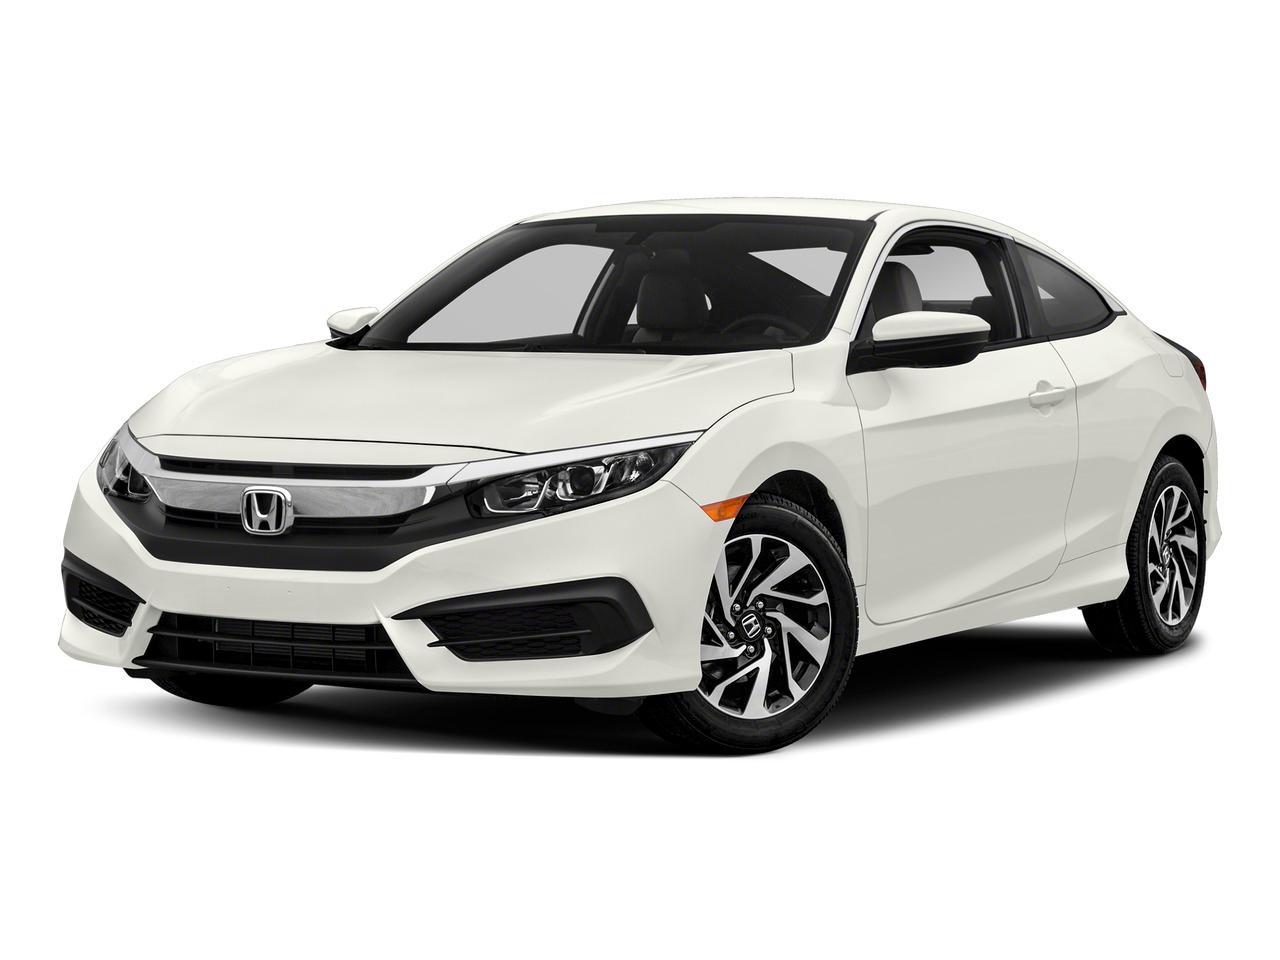 2018 Honda Civic Coupe Vehicle Photo in Pittsburg, CA 94565